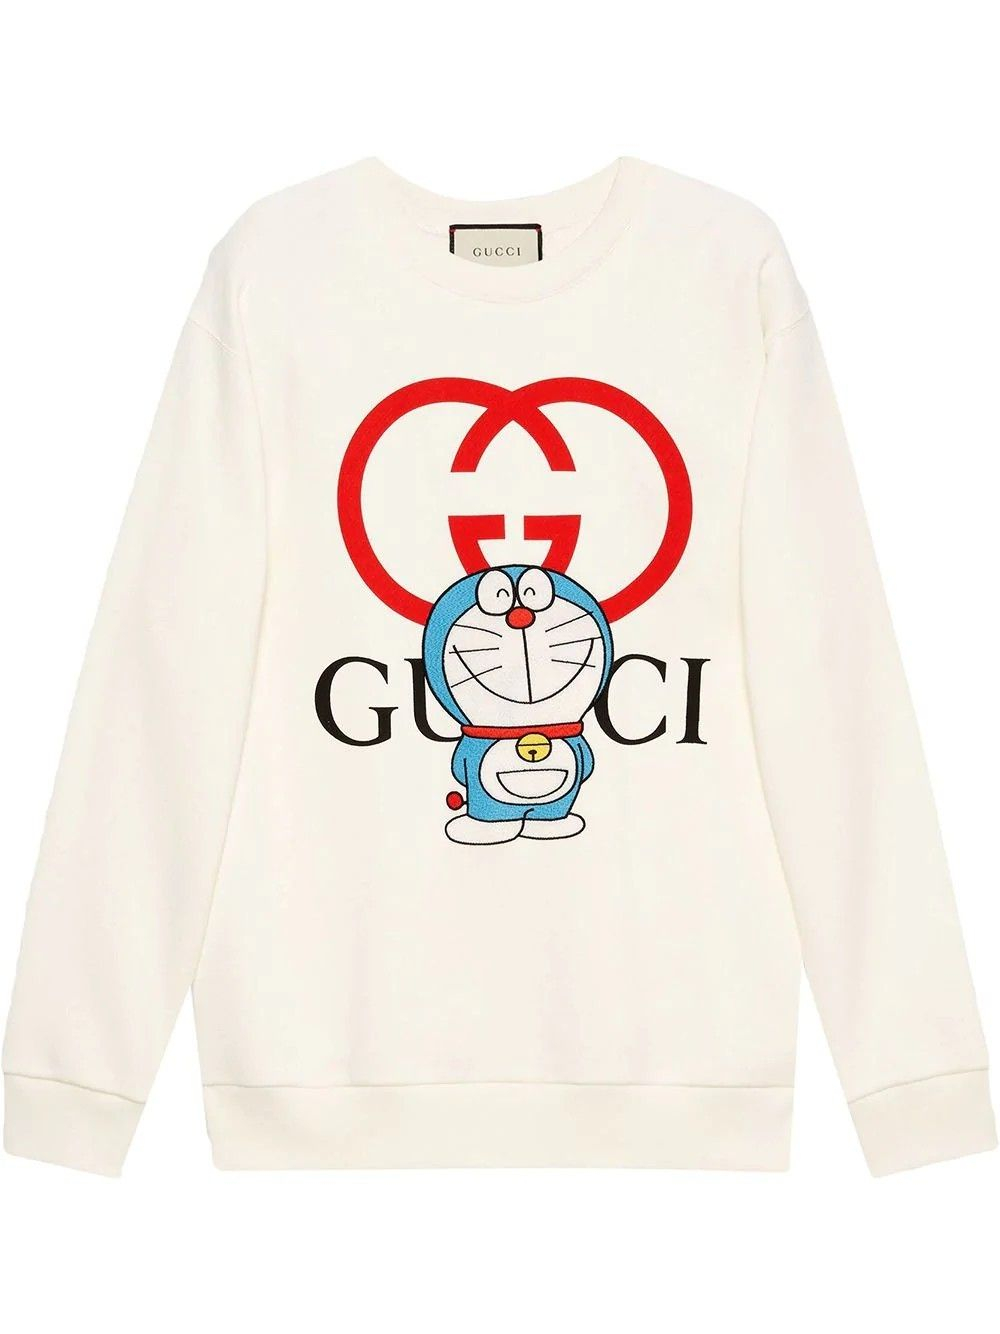 Gucci X Doraemon Crew Neck Sweatshirt In 2021 Sweatshirts Crew Neck Sweatshirt White Sweatshirt [ 1334 x 1000 Pixel ]